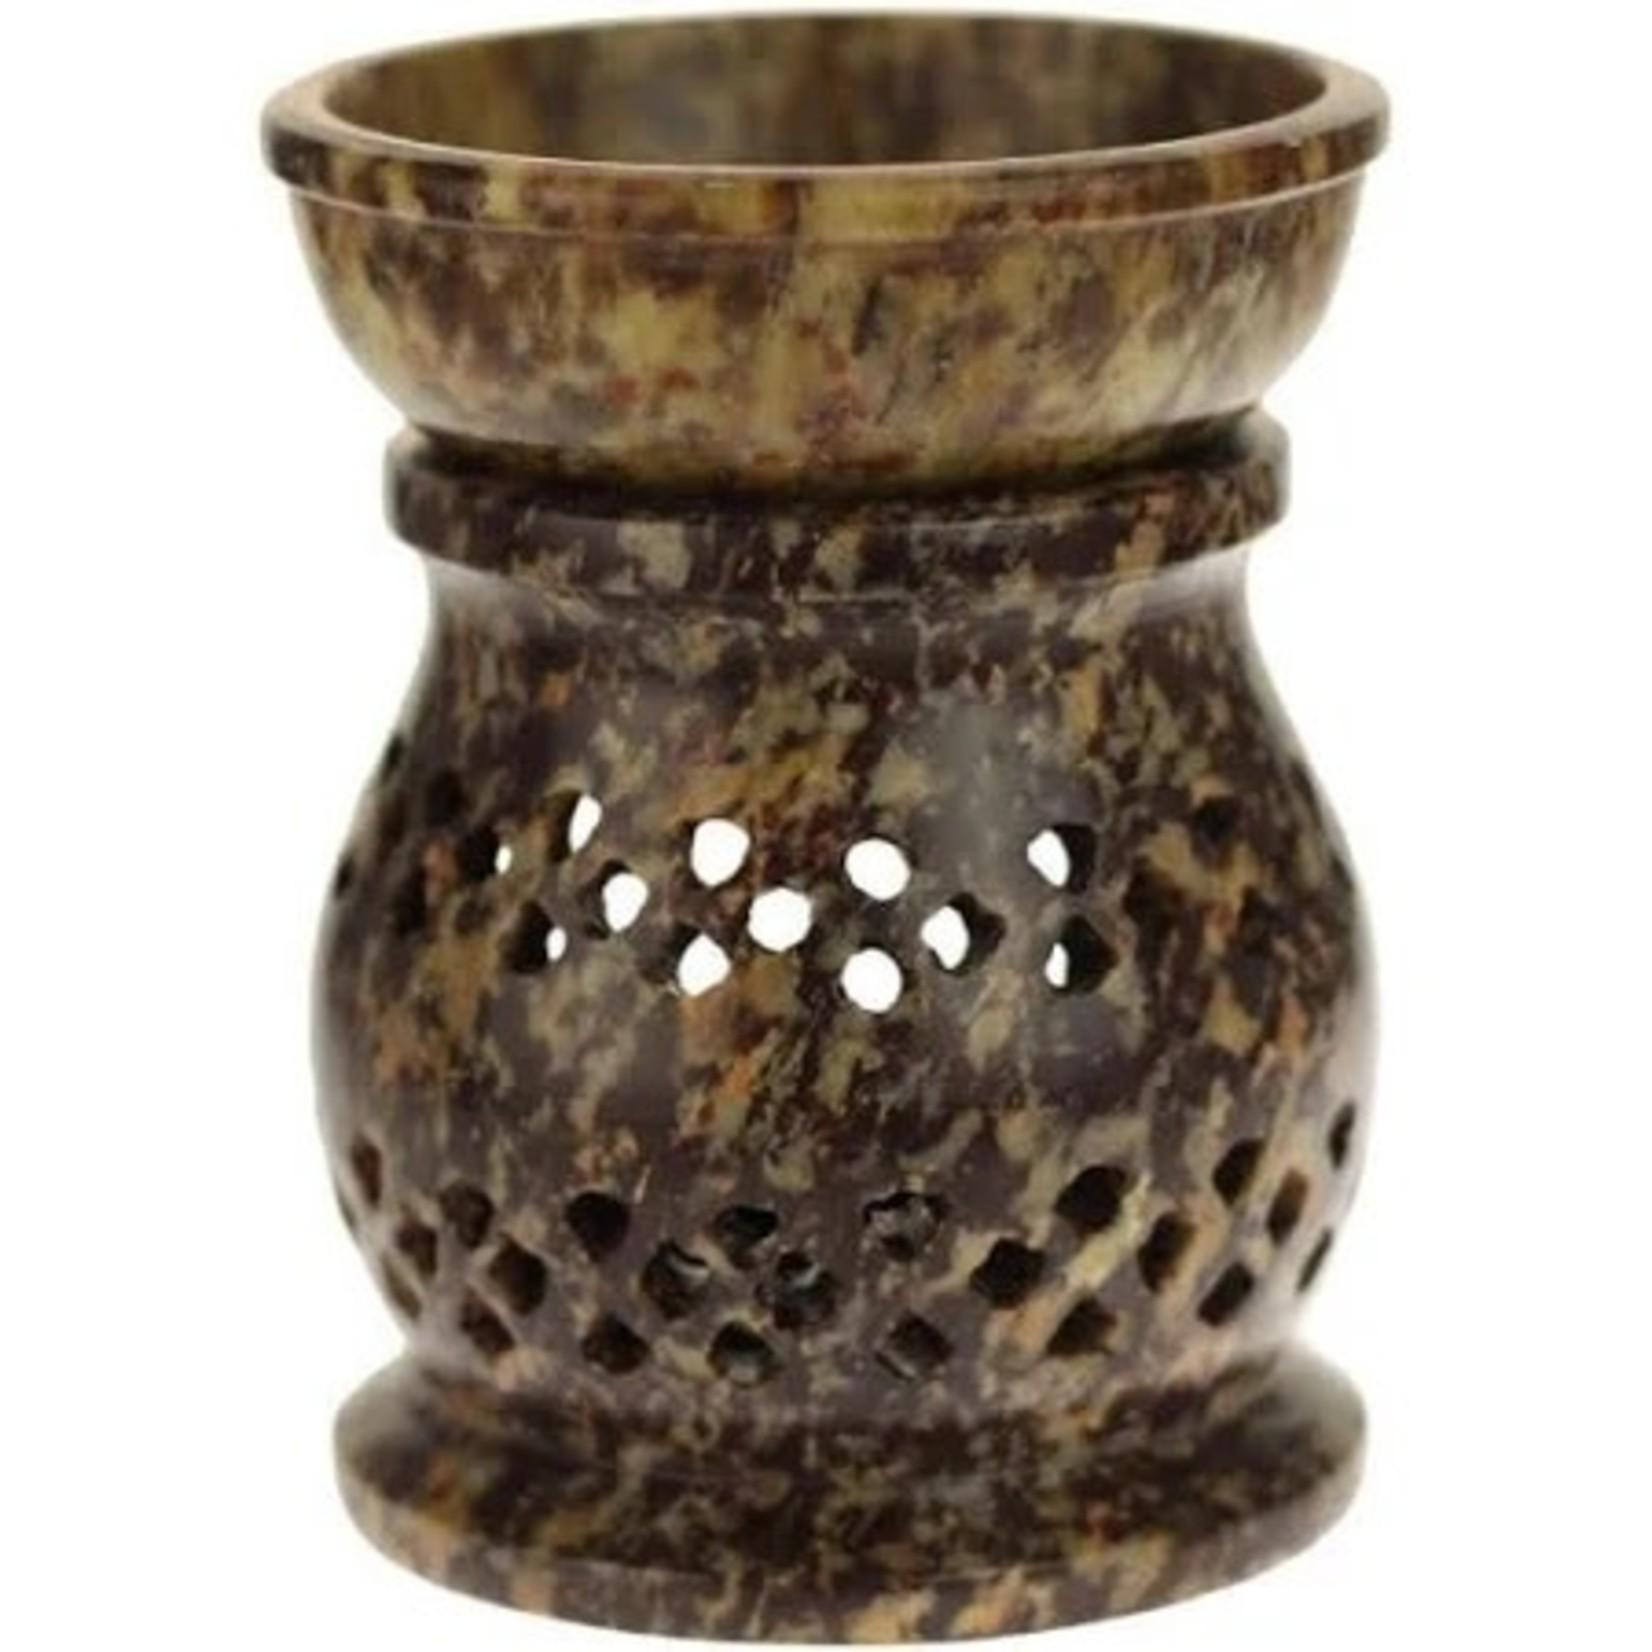 Prabhujis Gifts Soapstone Oil Burner Jali Medium